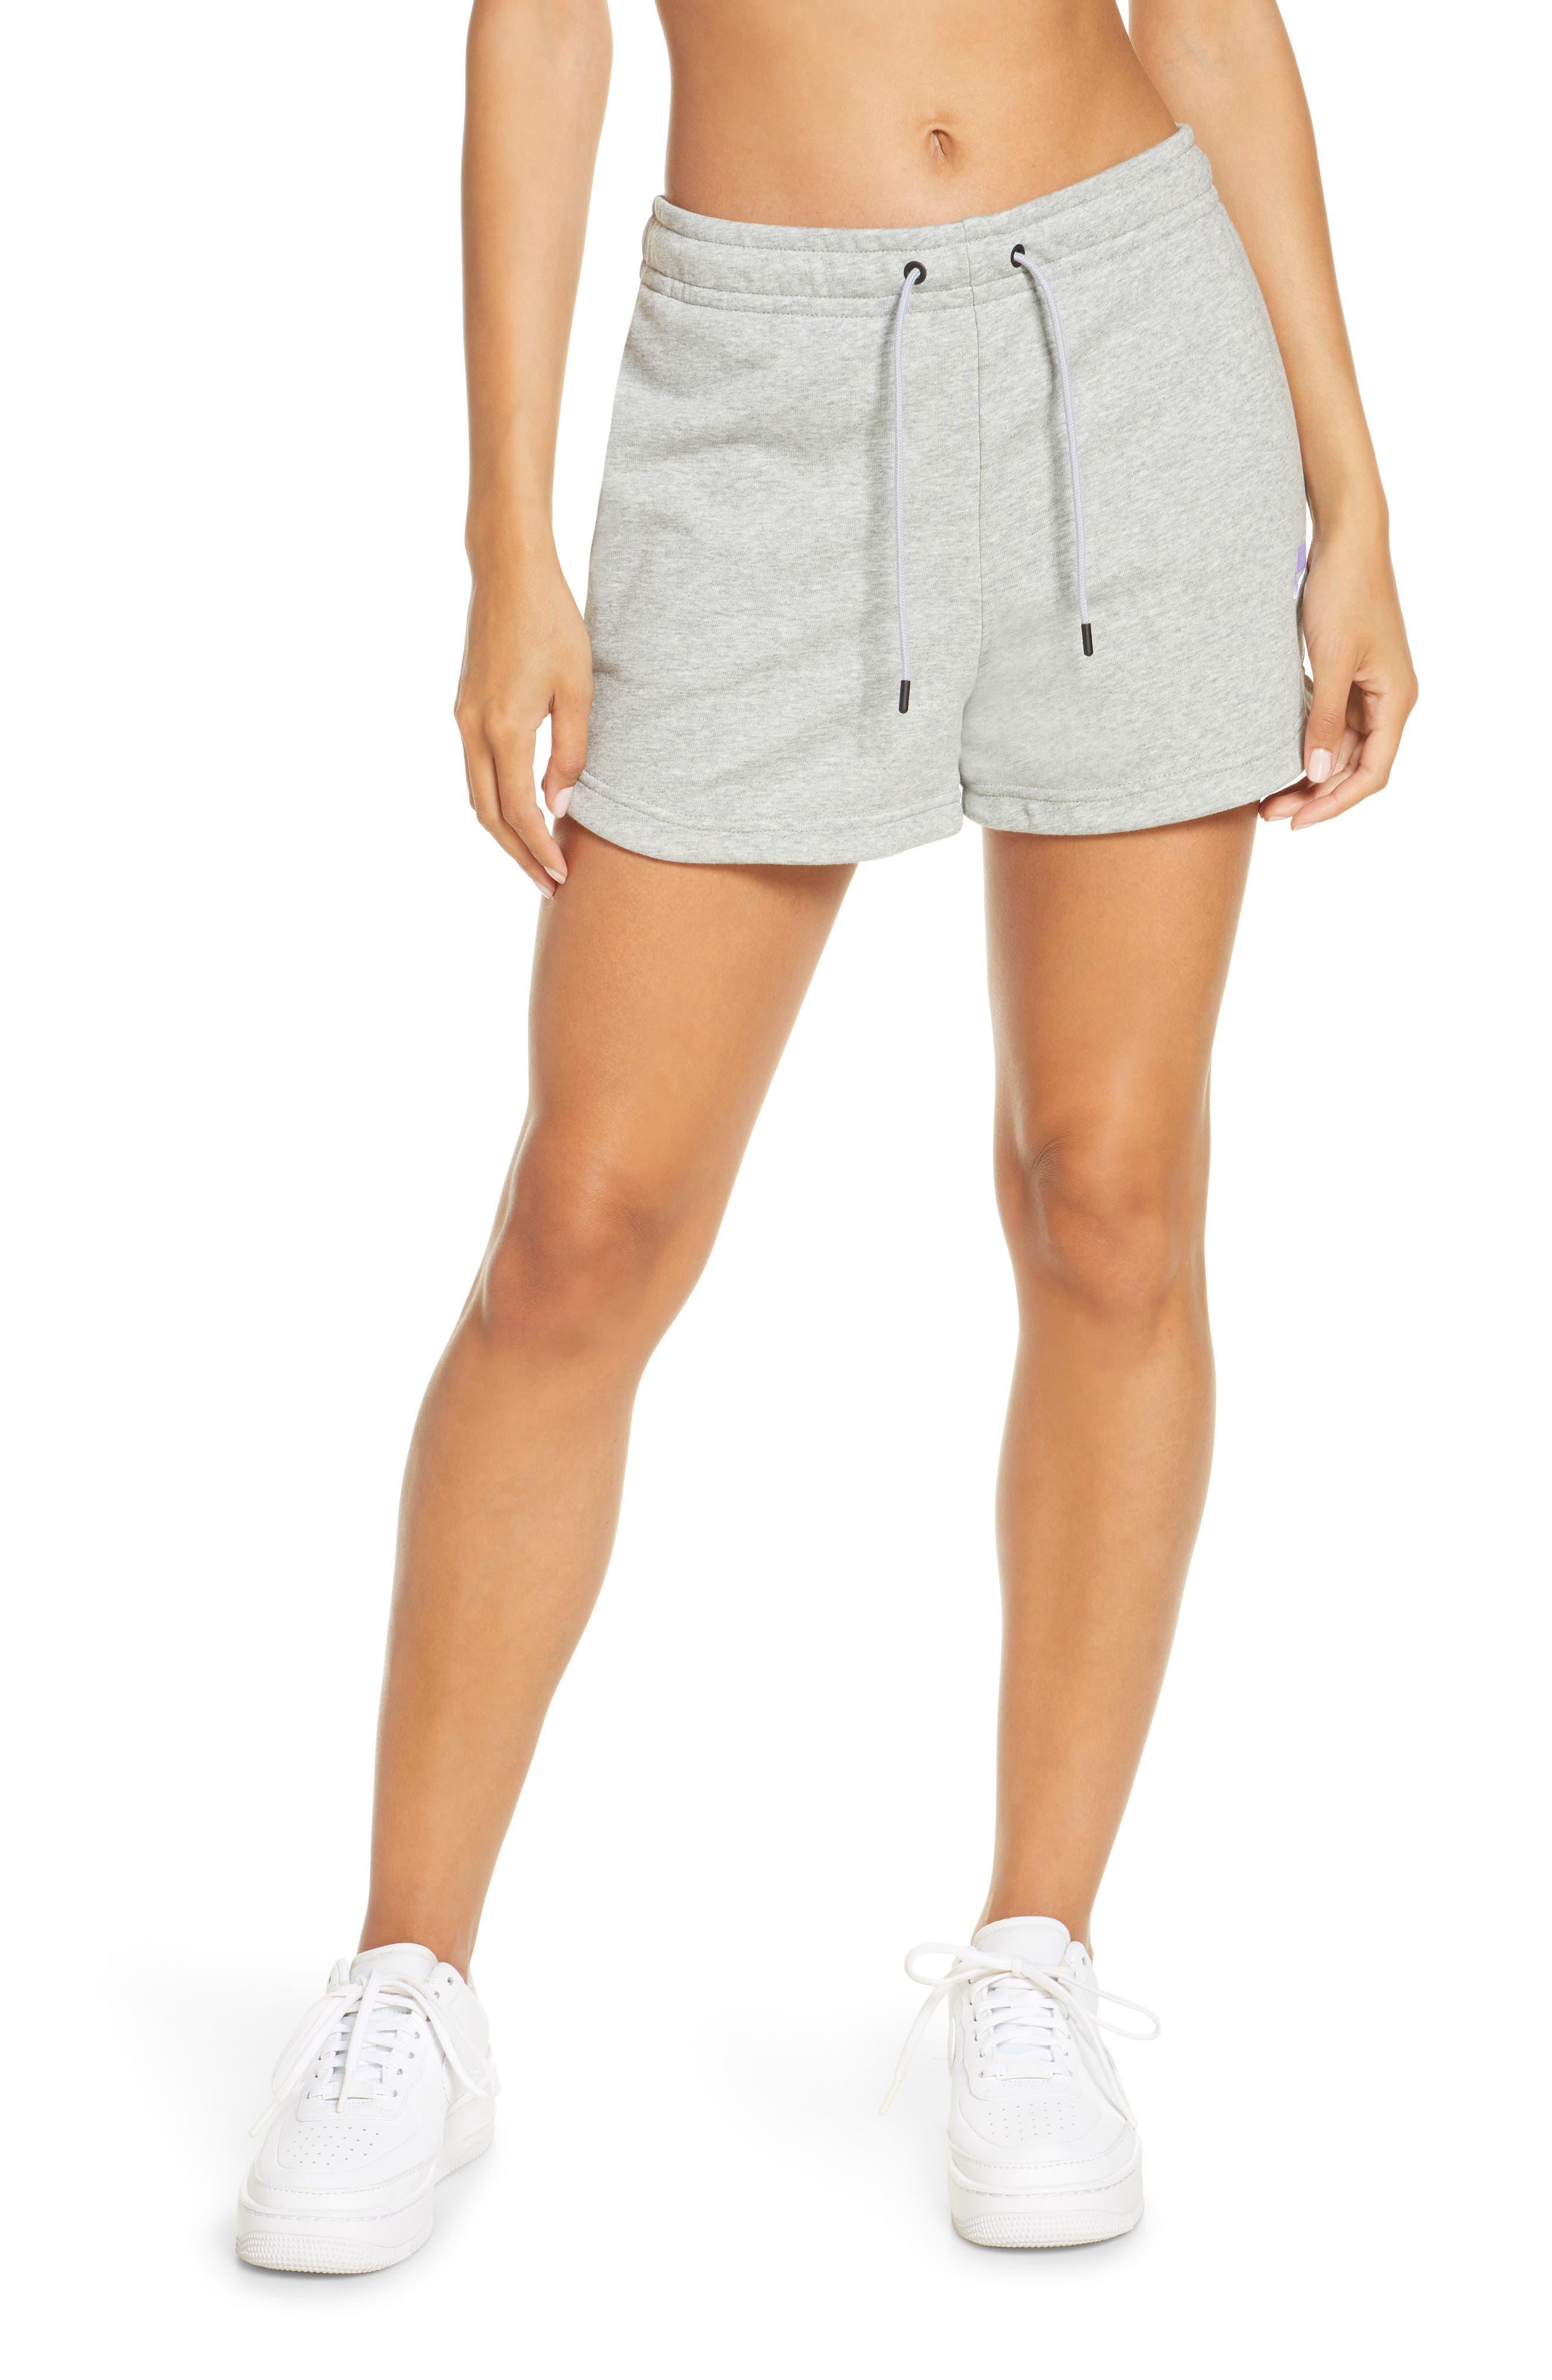 Women's Shorts Nike Clothing   Nordstrom